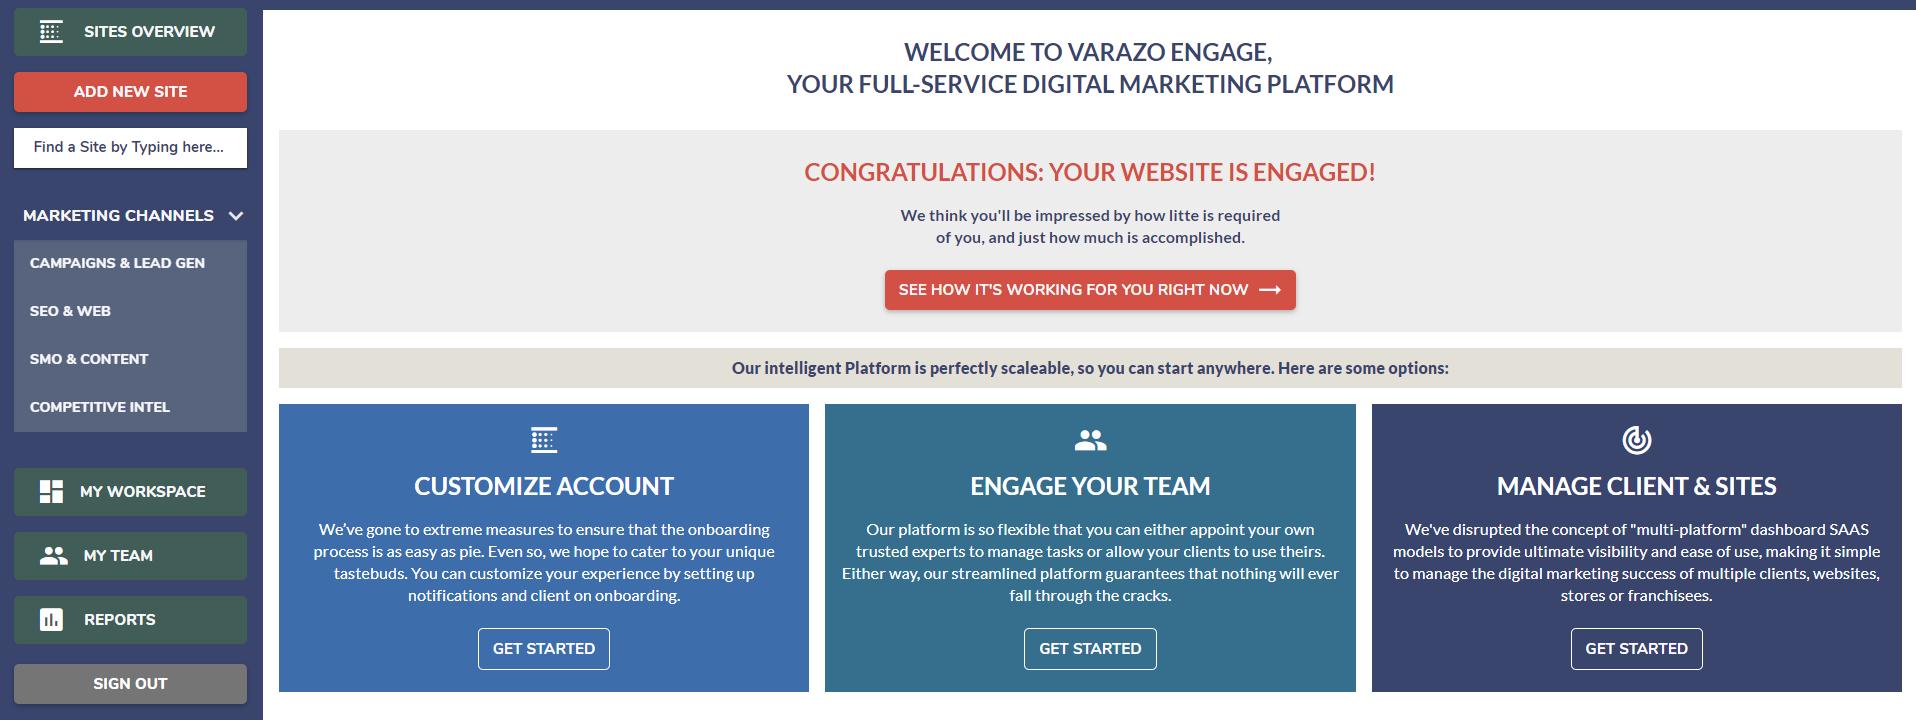 What is The Digital Marketing Management Platform?